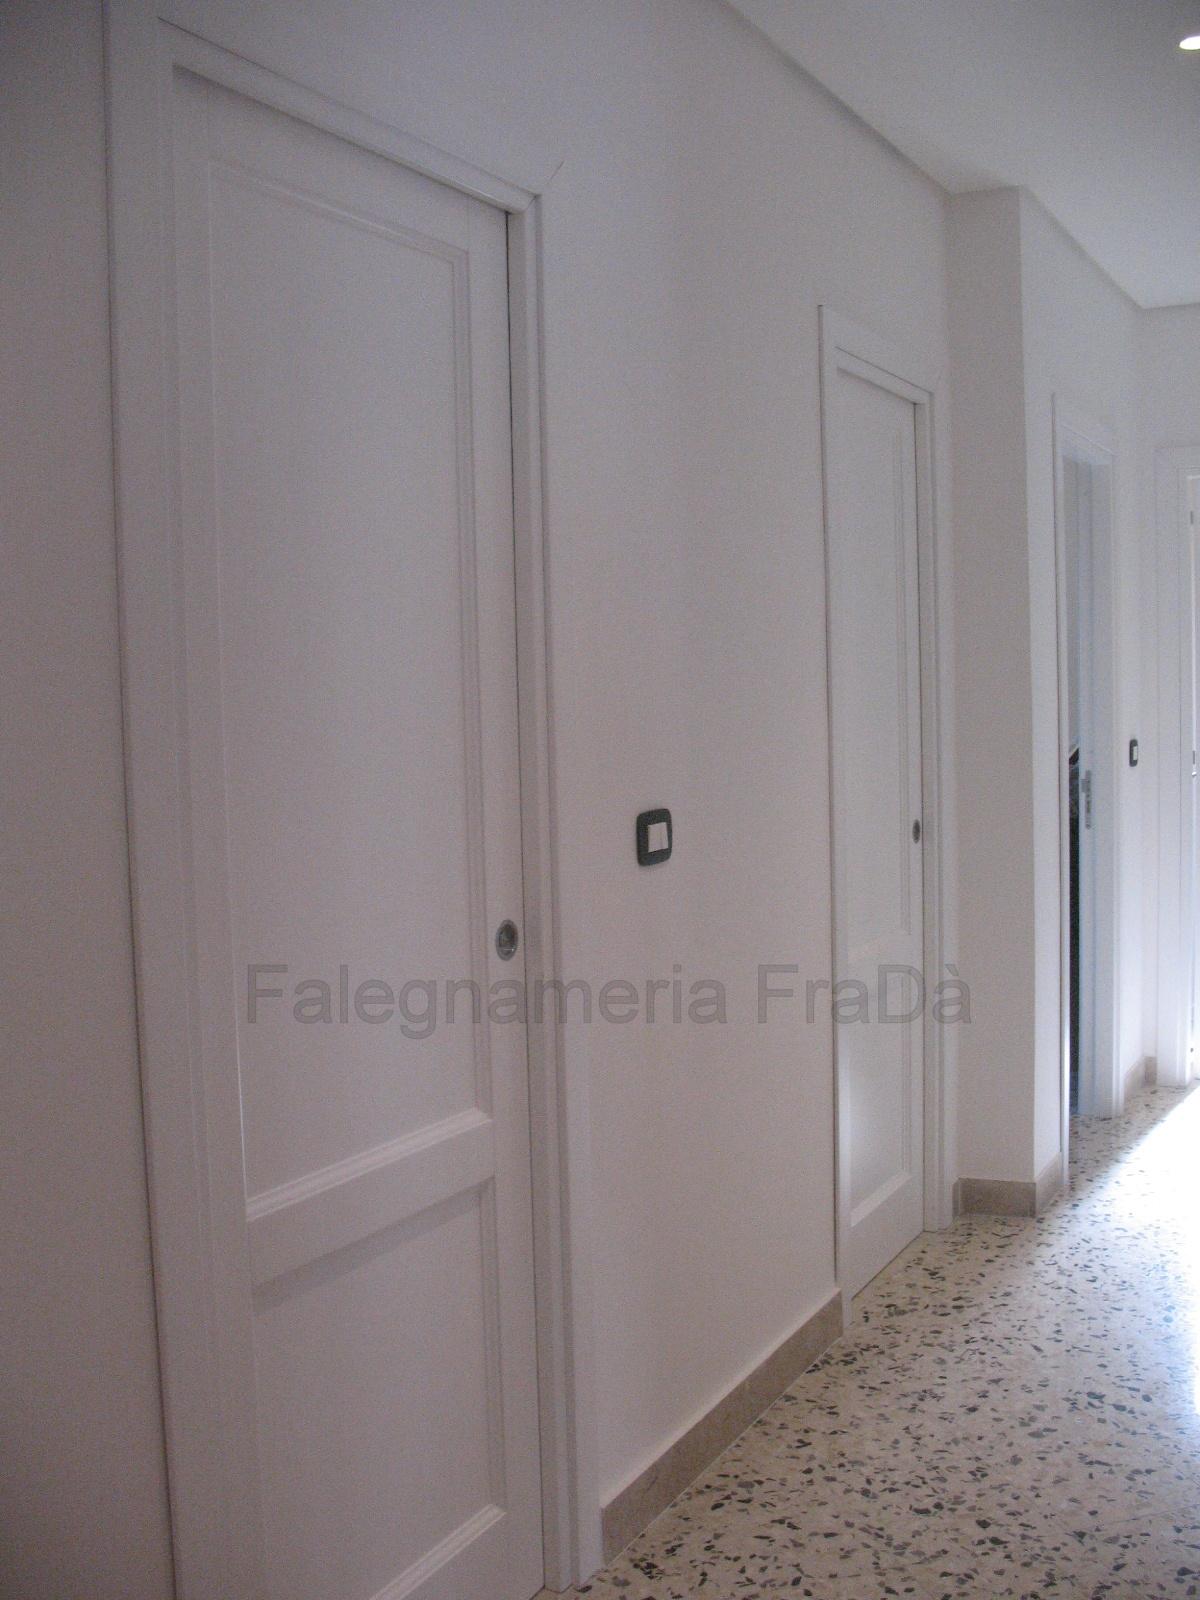 porte moderne laccate bianco